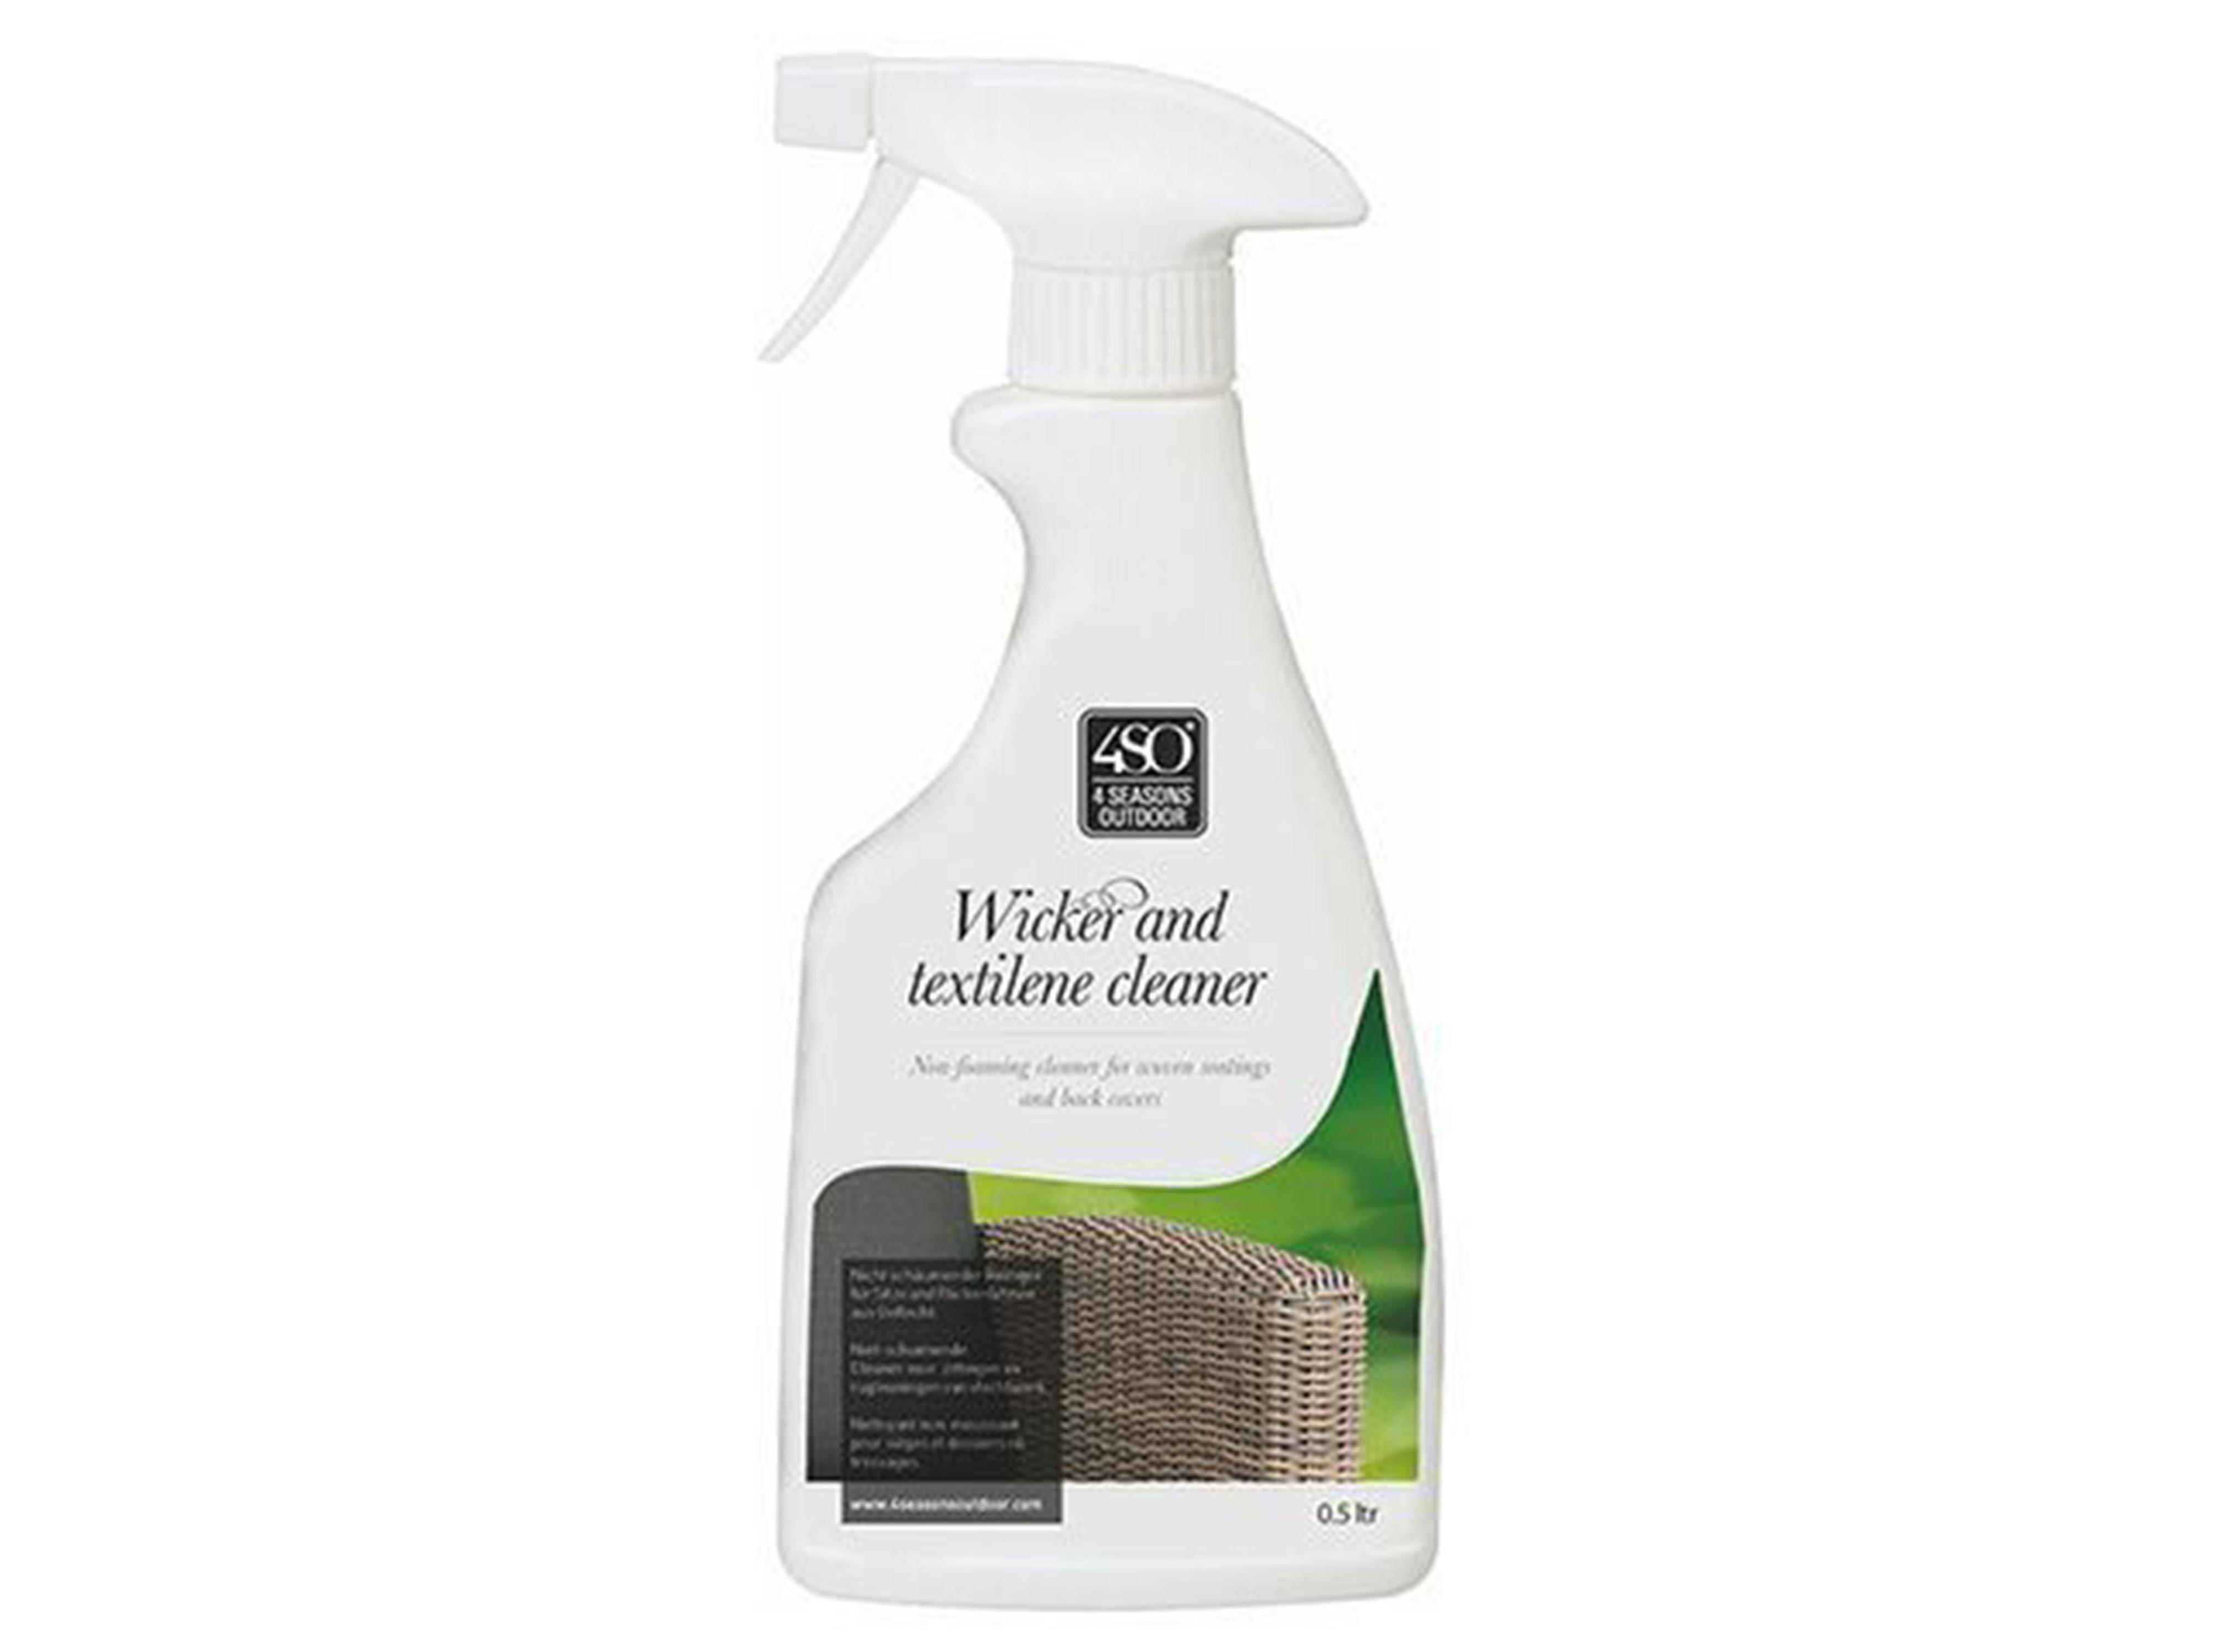 4 Seasons Outdoor | Wicker & Textilene Cleaner